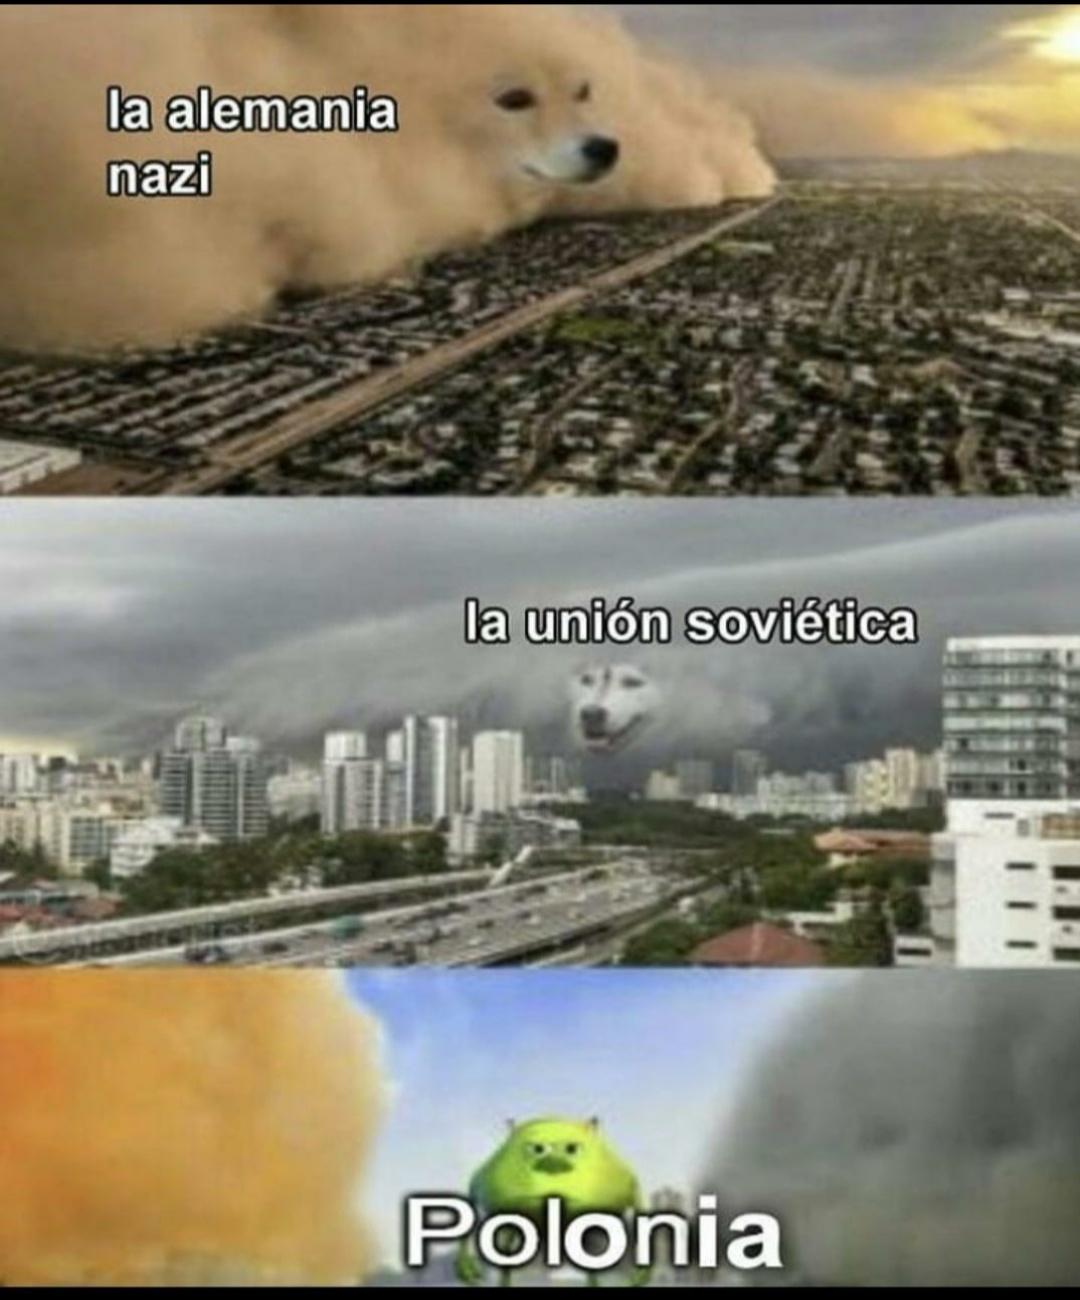 Polonia: XD - meme